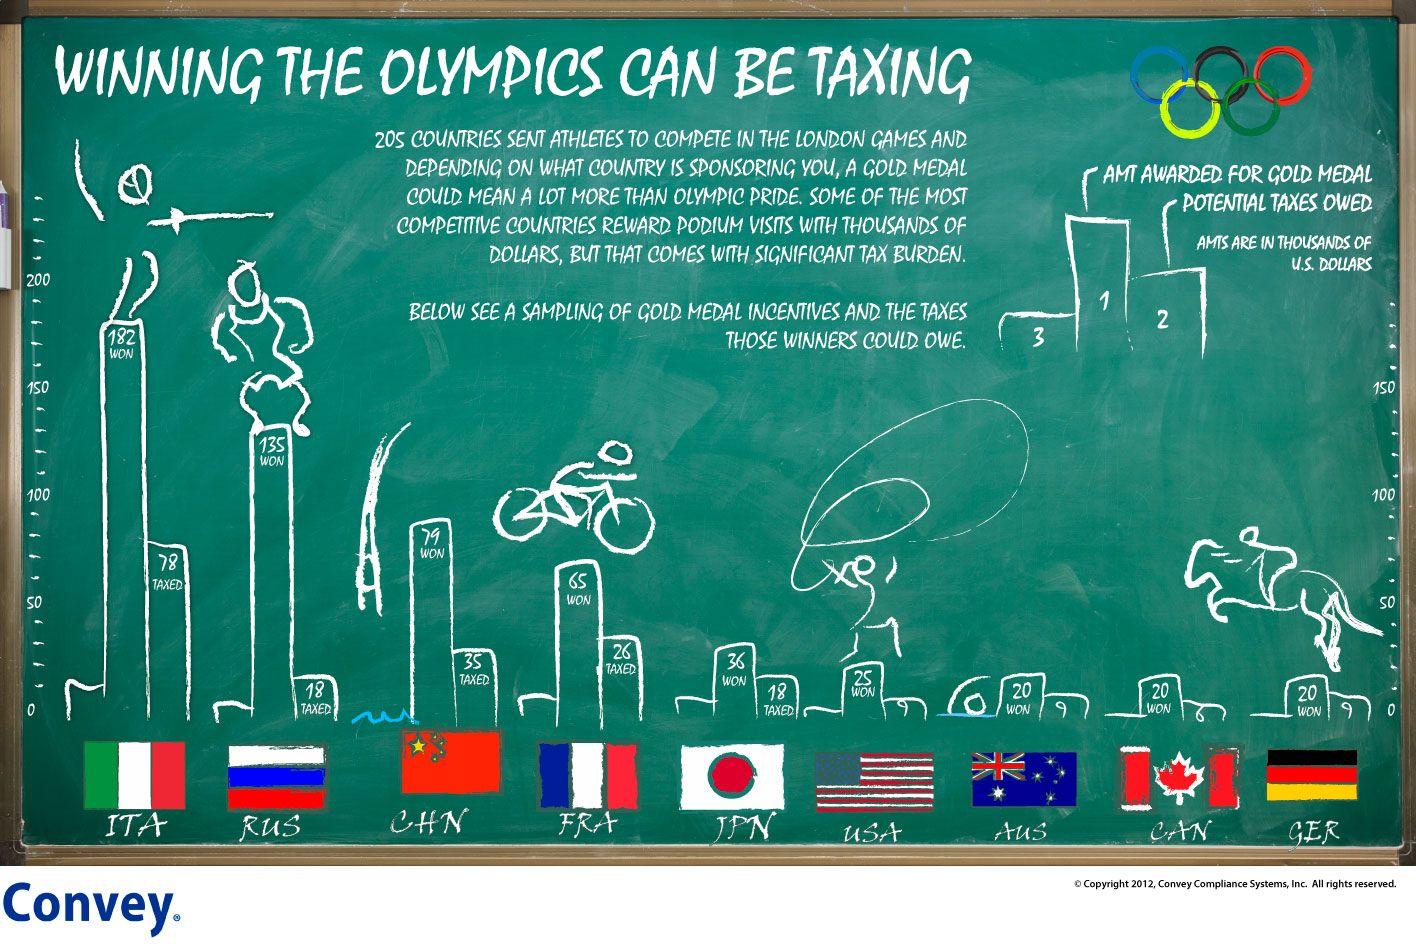 Olympic-Winnings-Taxed.jpg (1416×947)